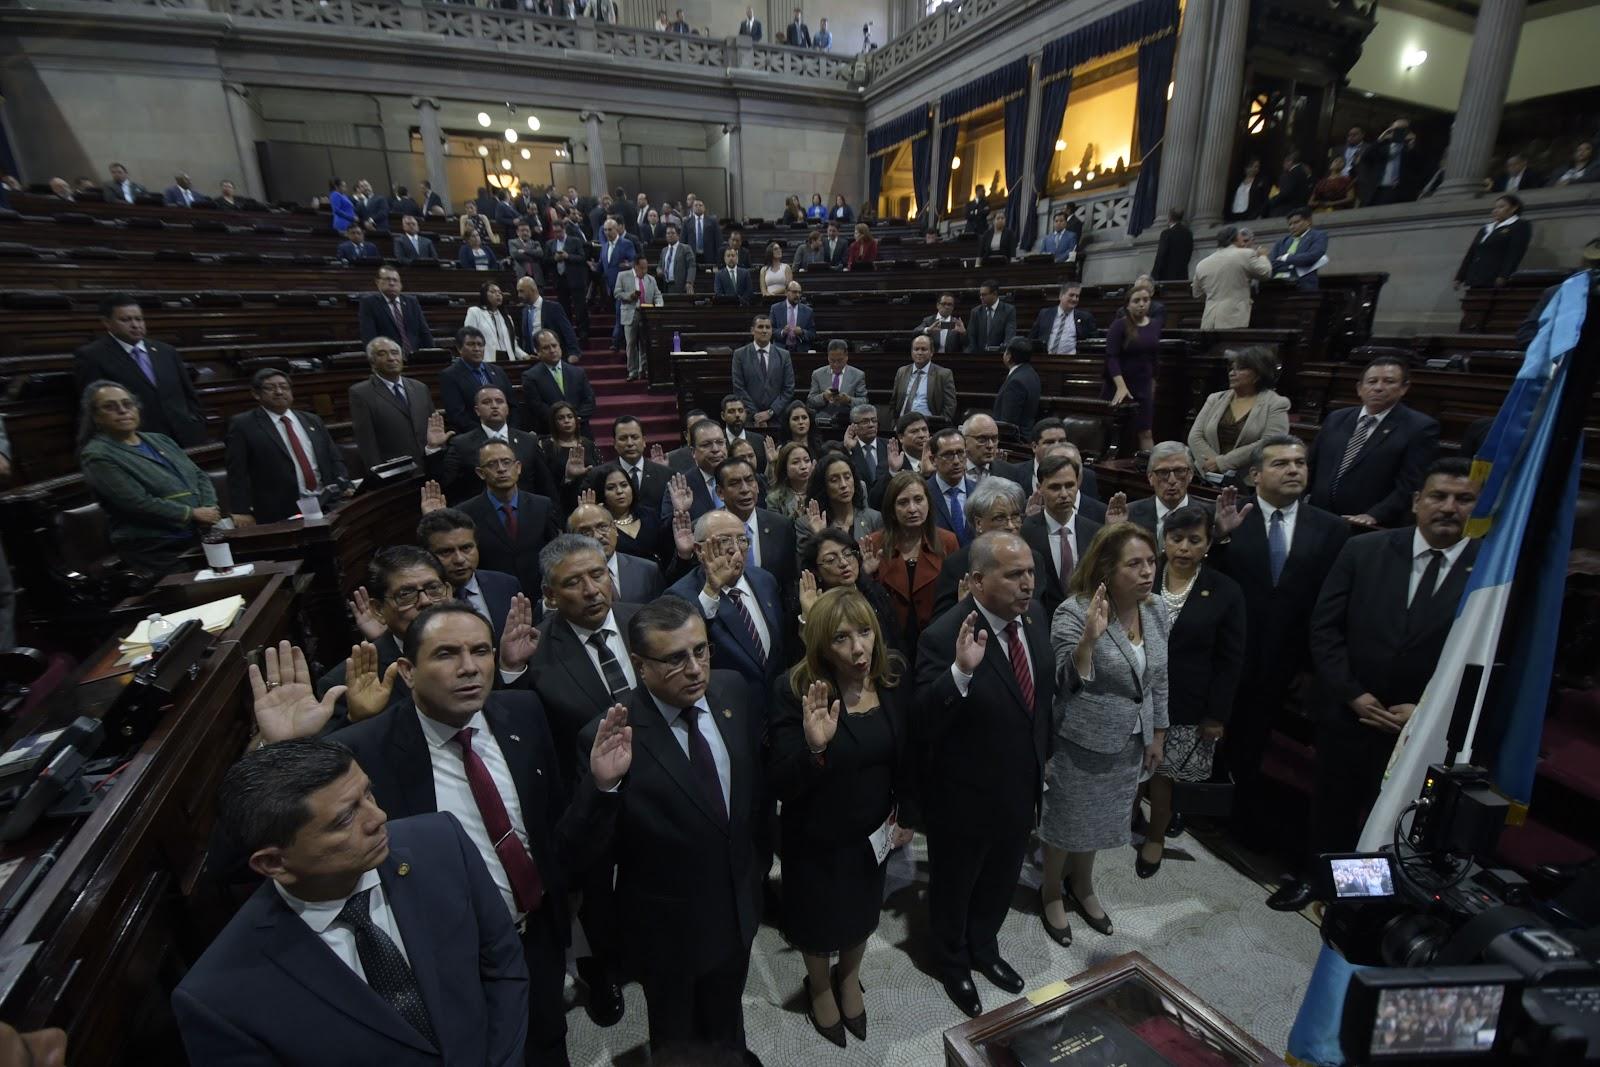 Los y las responsables de escoger el futuro de la justicia en Guatemala DEX VV8PFWaG rRewhpHYCURyvmx2K5U9jX21ZnUZaI3a9DDXAG 89hZjCyfkHKlPuWkIKvpfIGlB8INfy9xl4OU9aBOvIeK Fg53EoXTt7ZjU5SOjIqtR k44xeJb0xBRo6X 1s